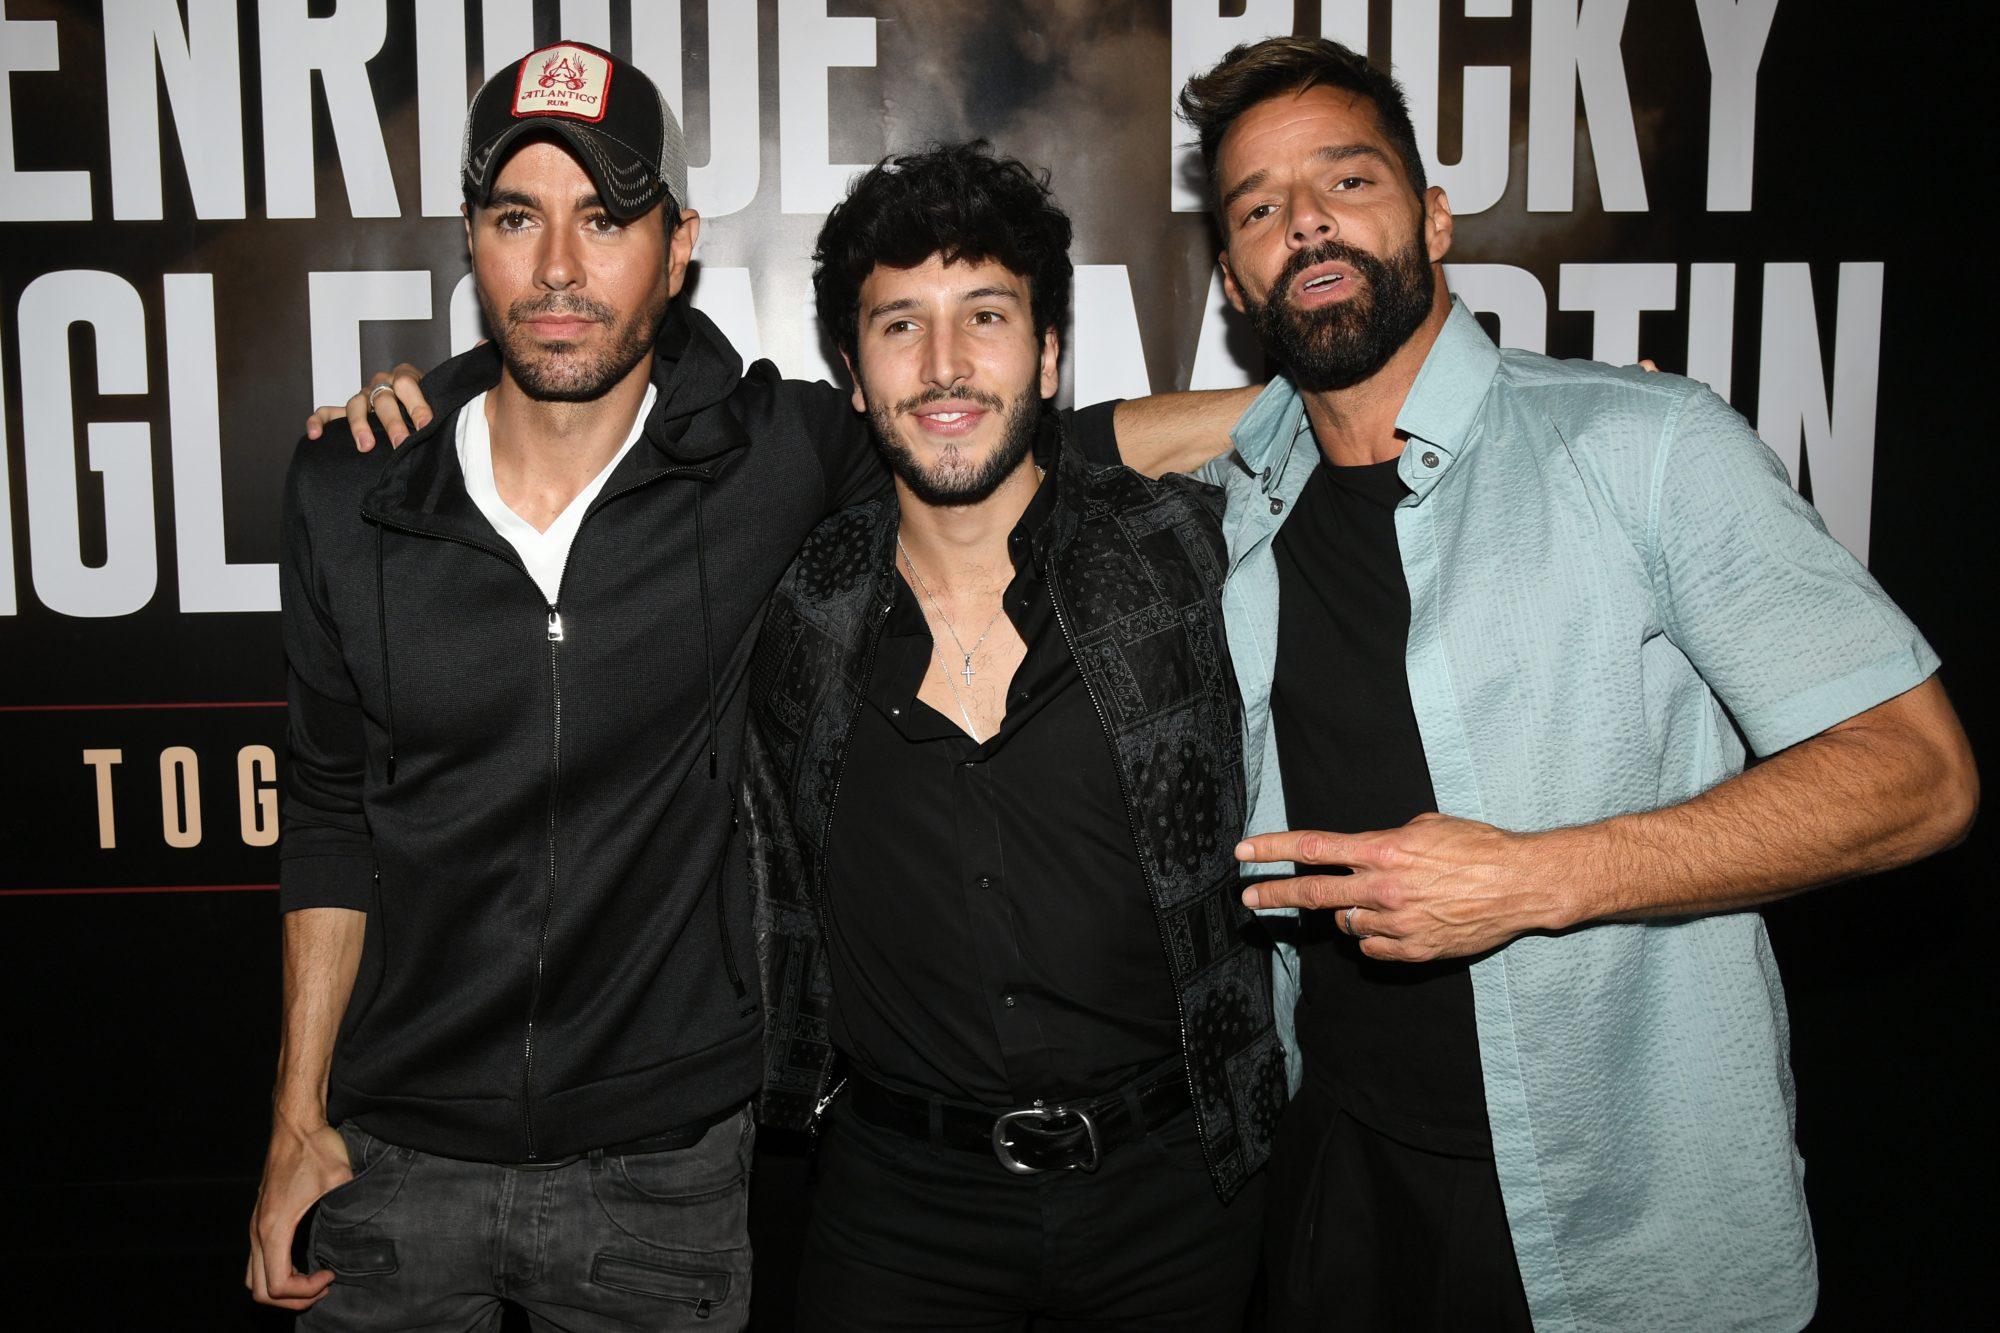 Enrique Iglesias, Ricky Martin and Sebastian Yatra